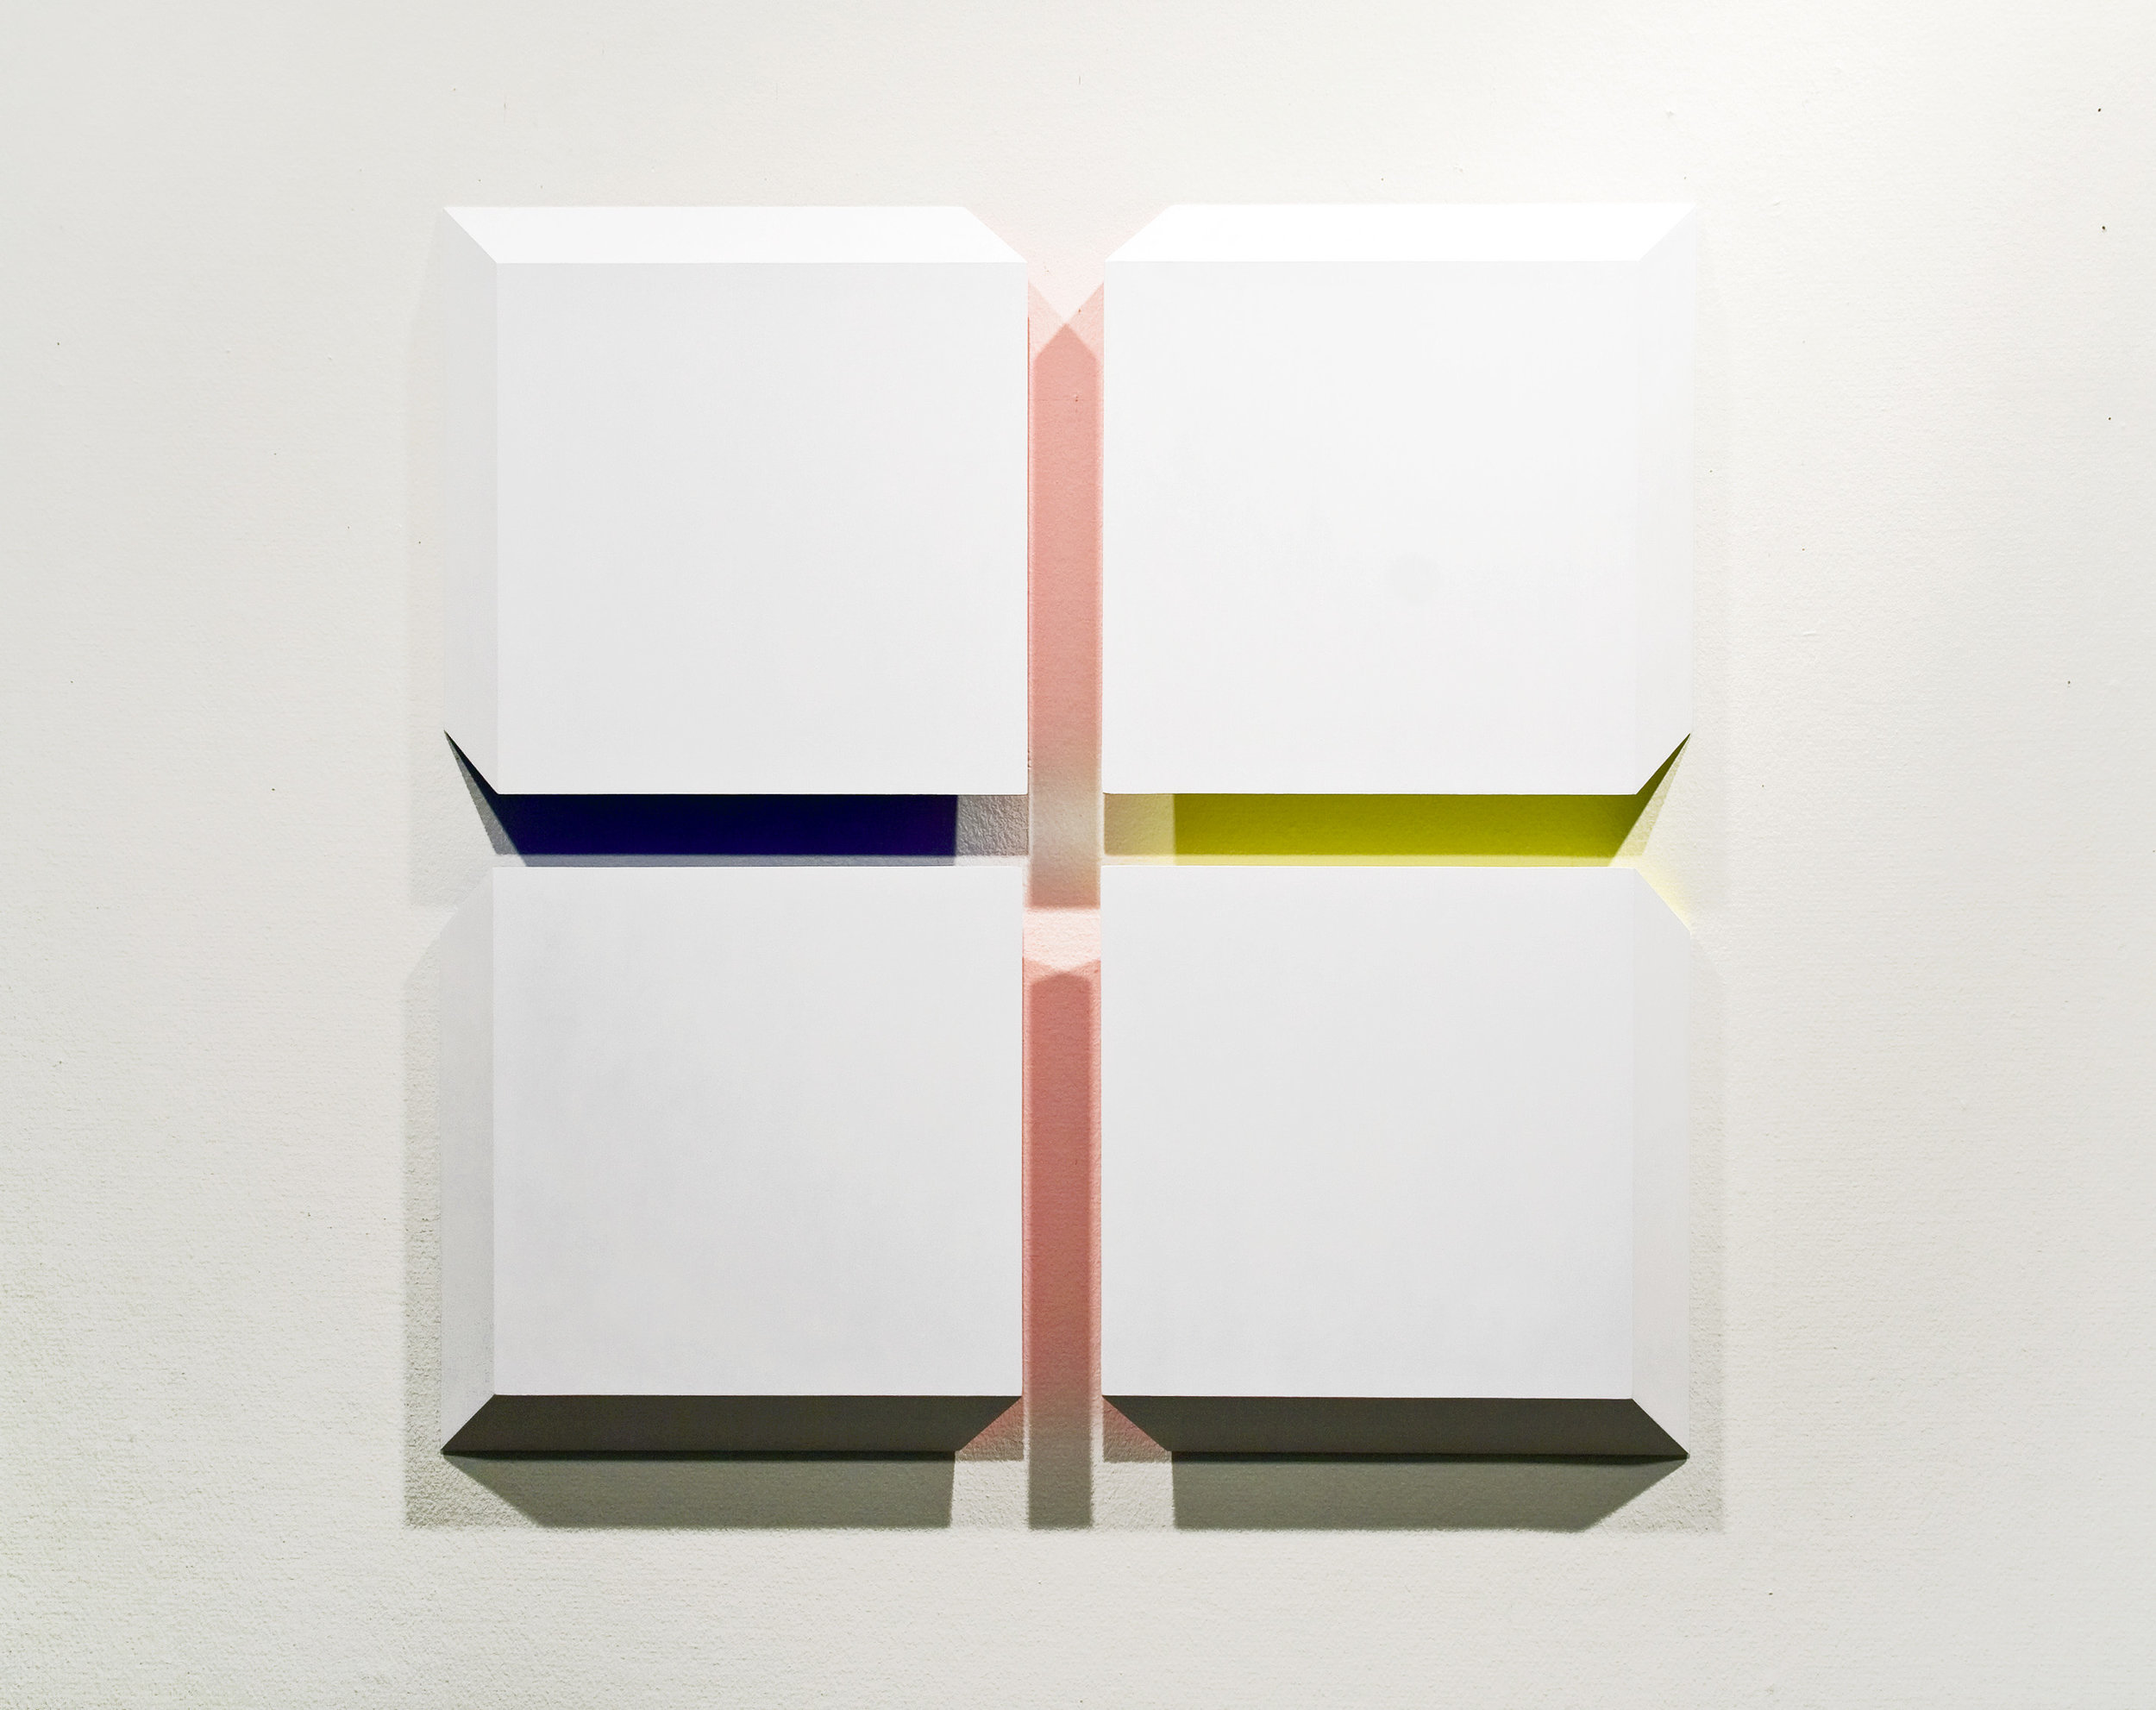 1b akril, les, 100 x 100 cm, 2006.jpg